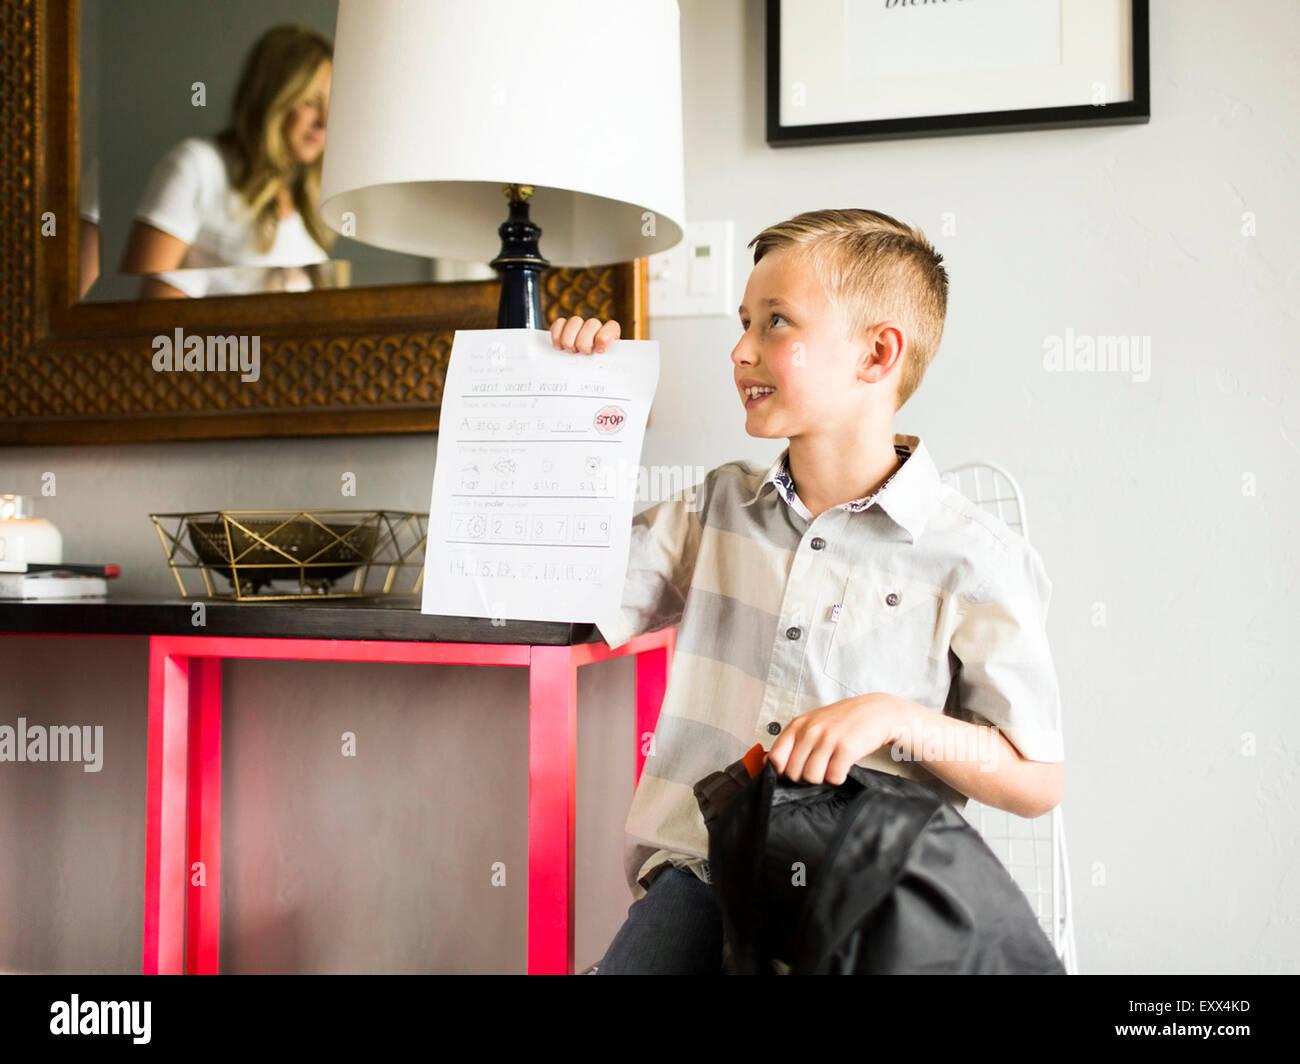 Smiling boy (6-7) showing schoolpaper - Stock Image